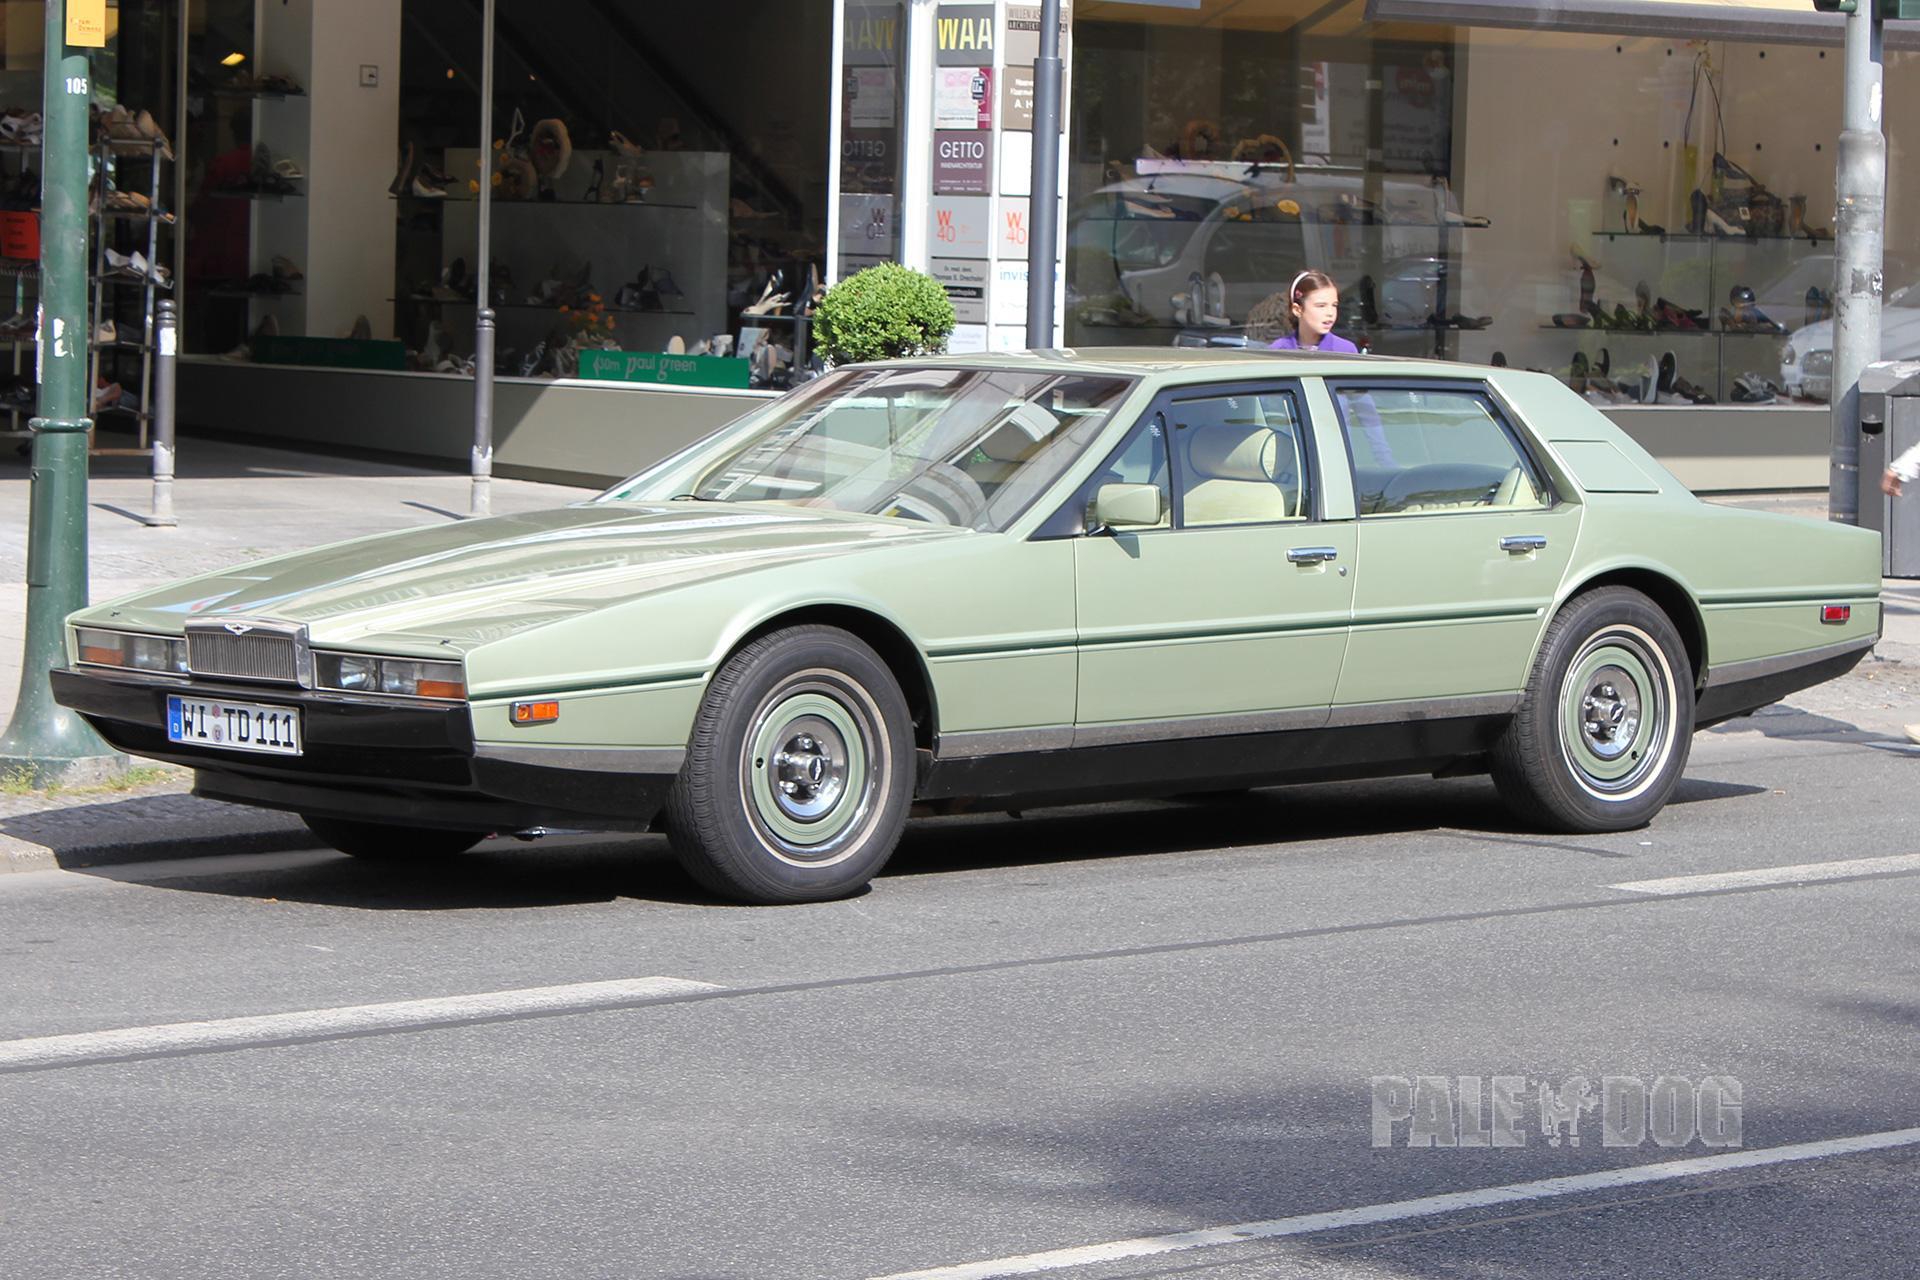 1983 Aston Martin Lagonda Front View 1980s Paledog Photo Collection